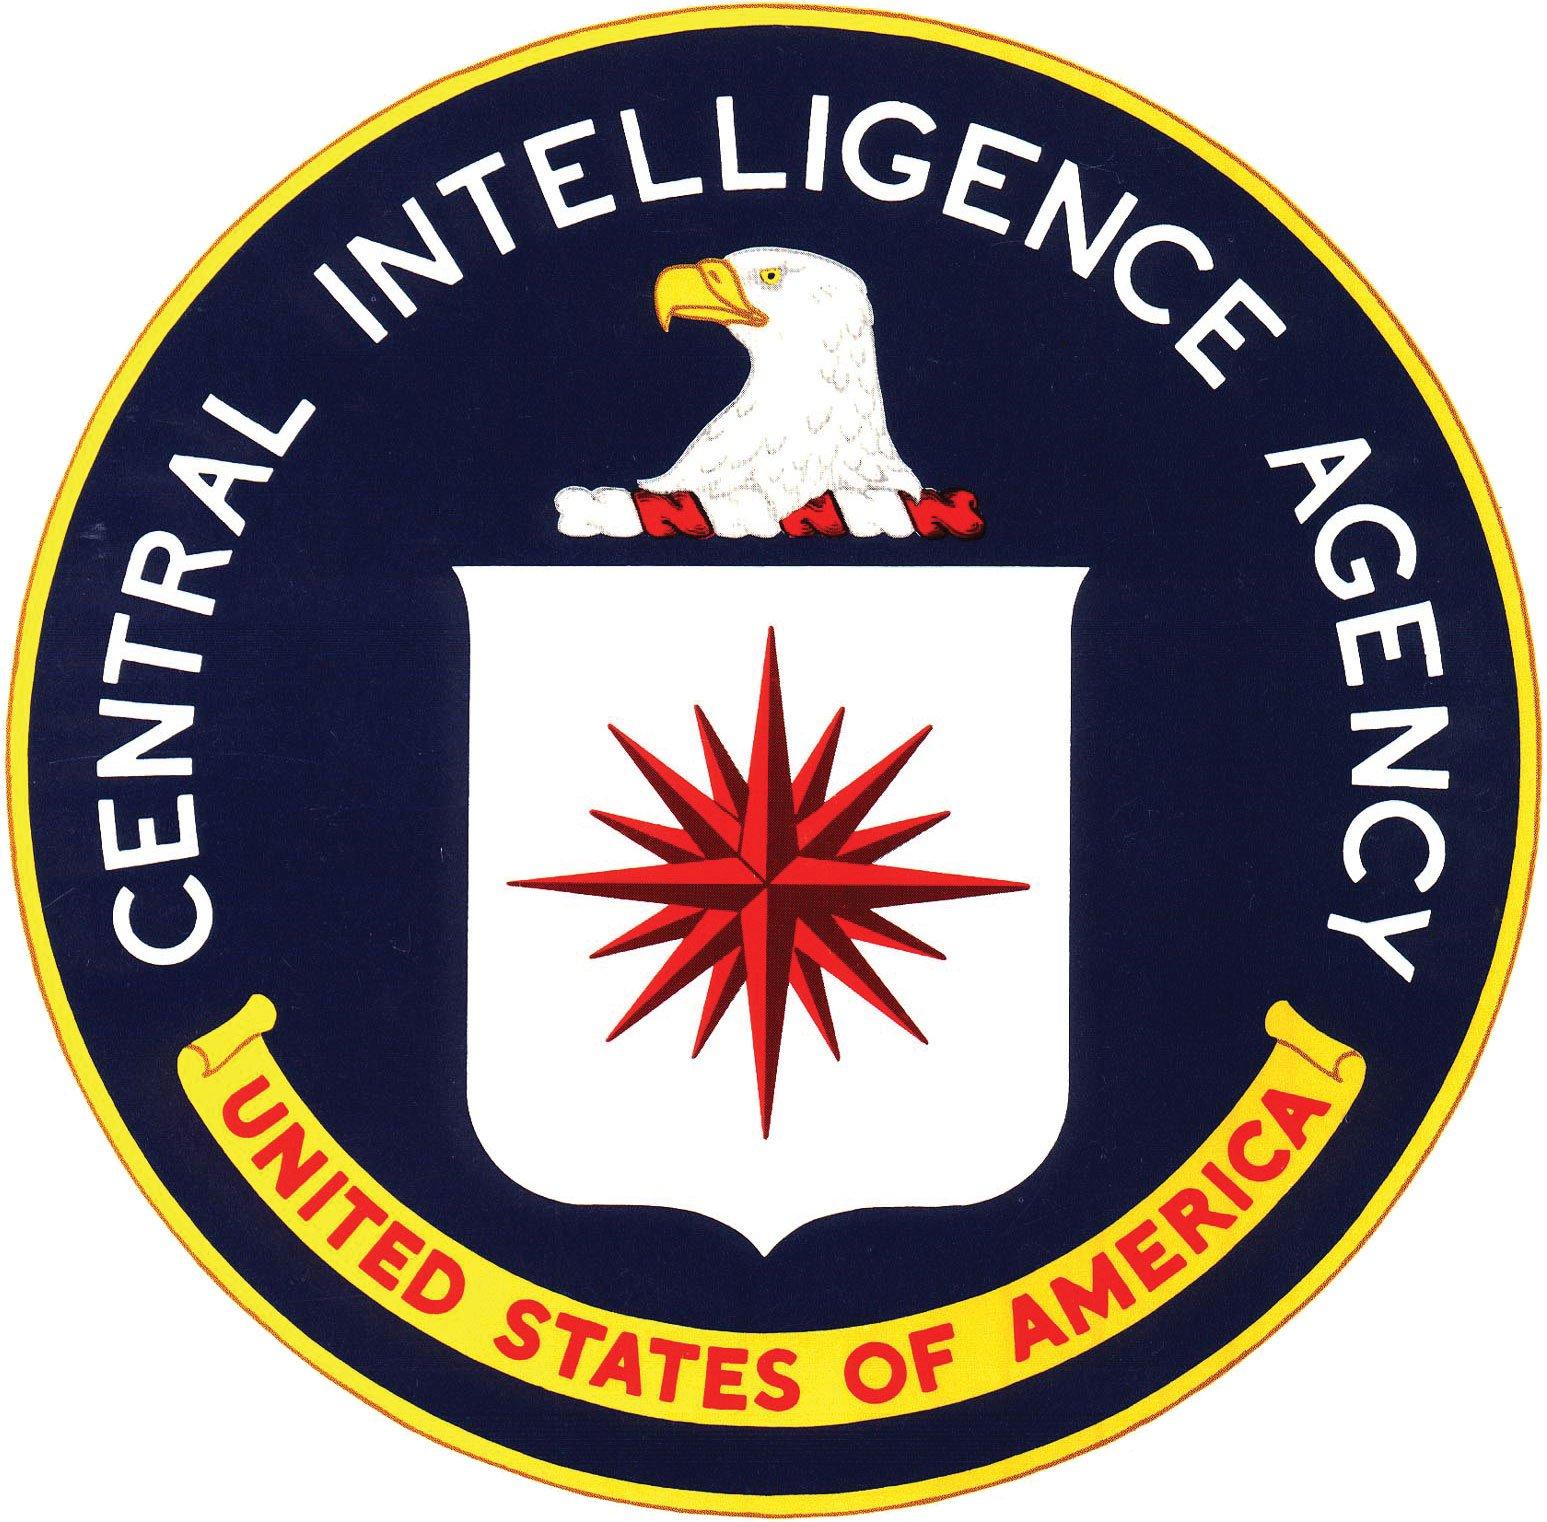 48 central intelligence agency wallpaper on wallpapersafari central intelligence agency wallpaper